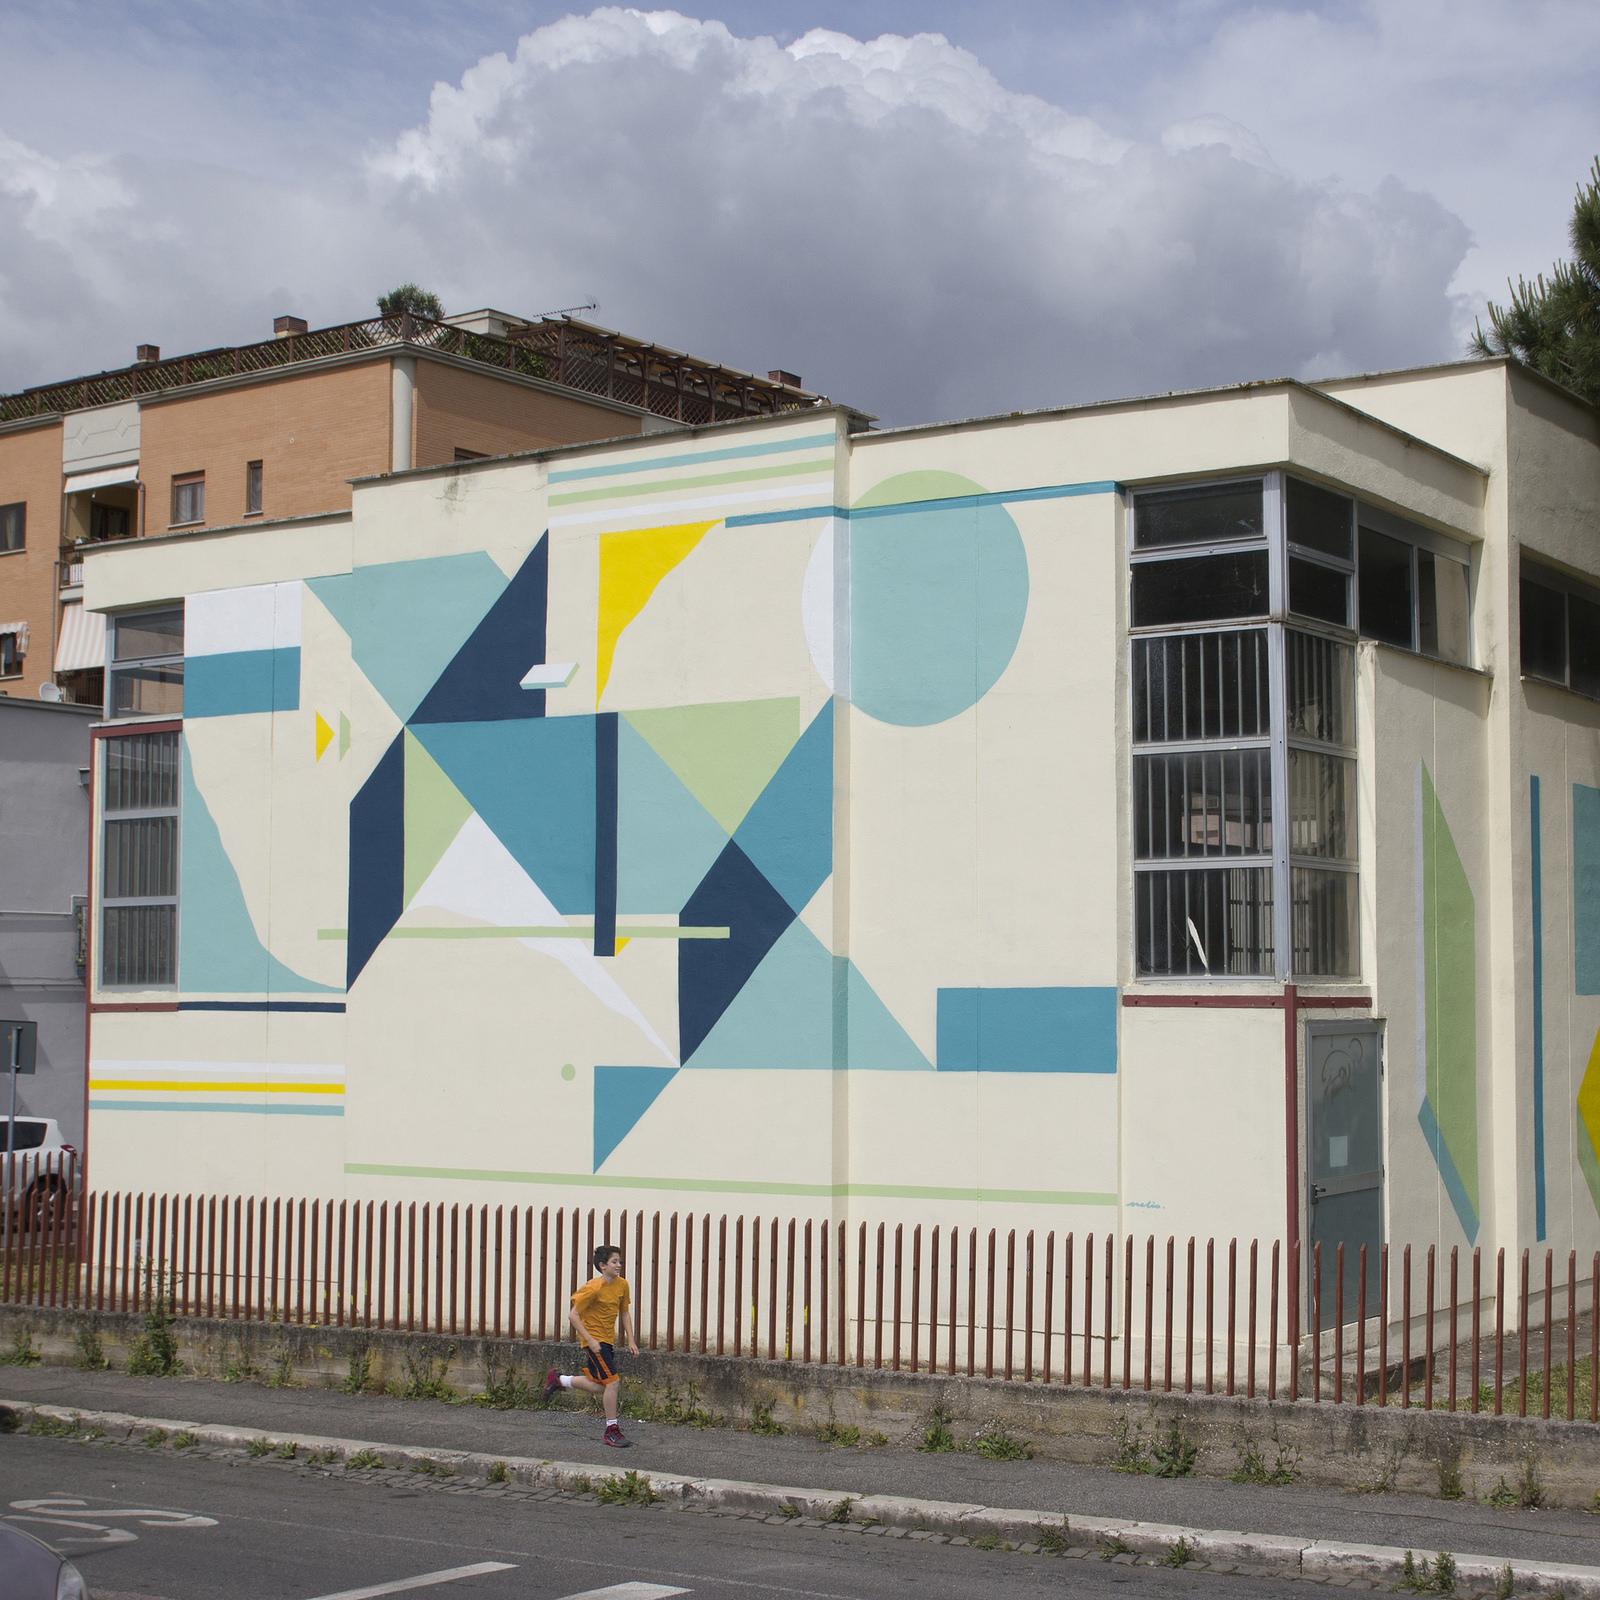 nelio-new-murals-for-memorie-urbane-festival-2014-03